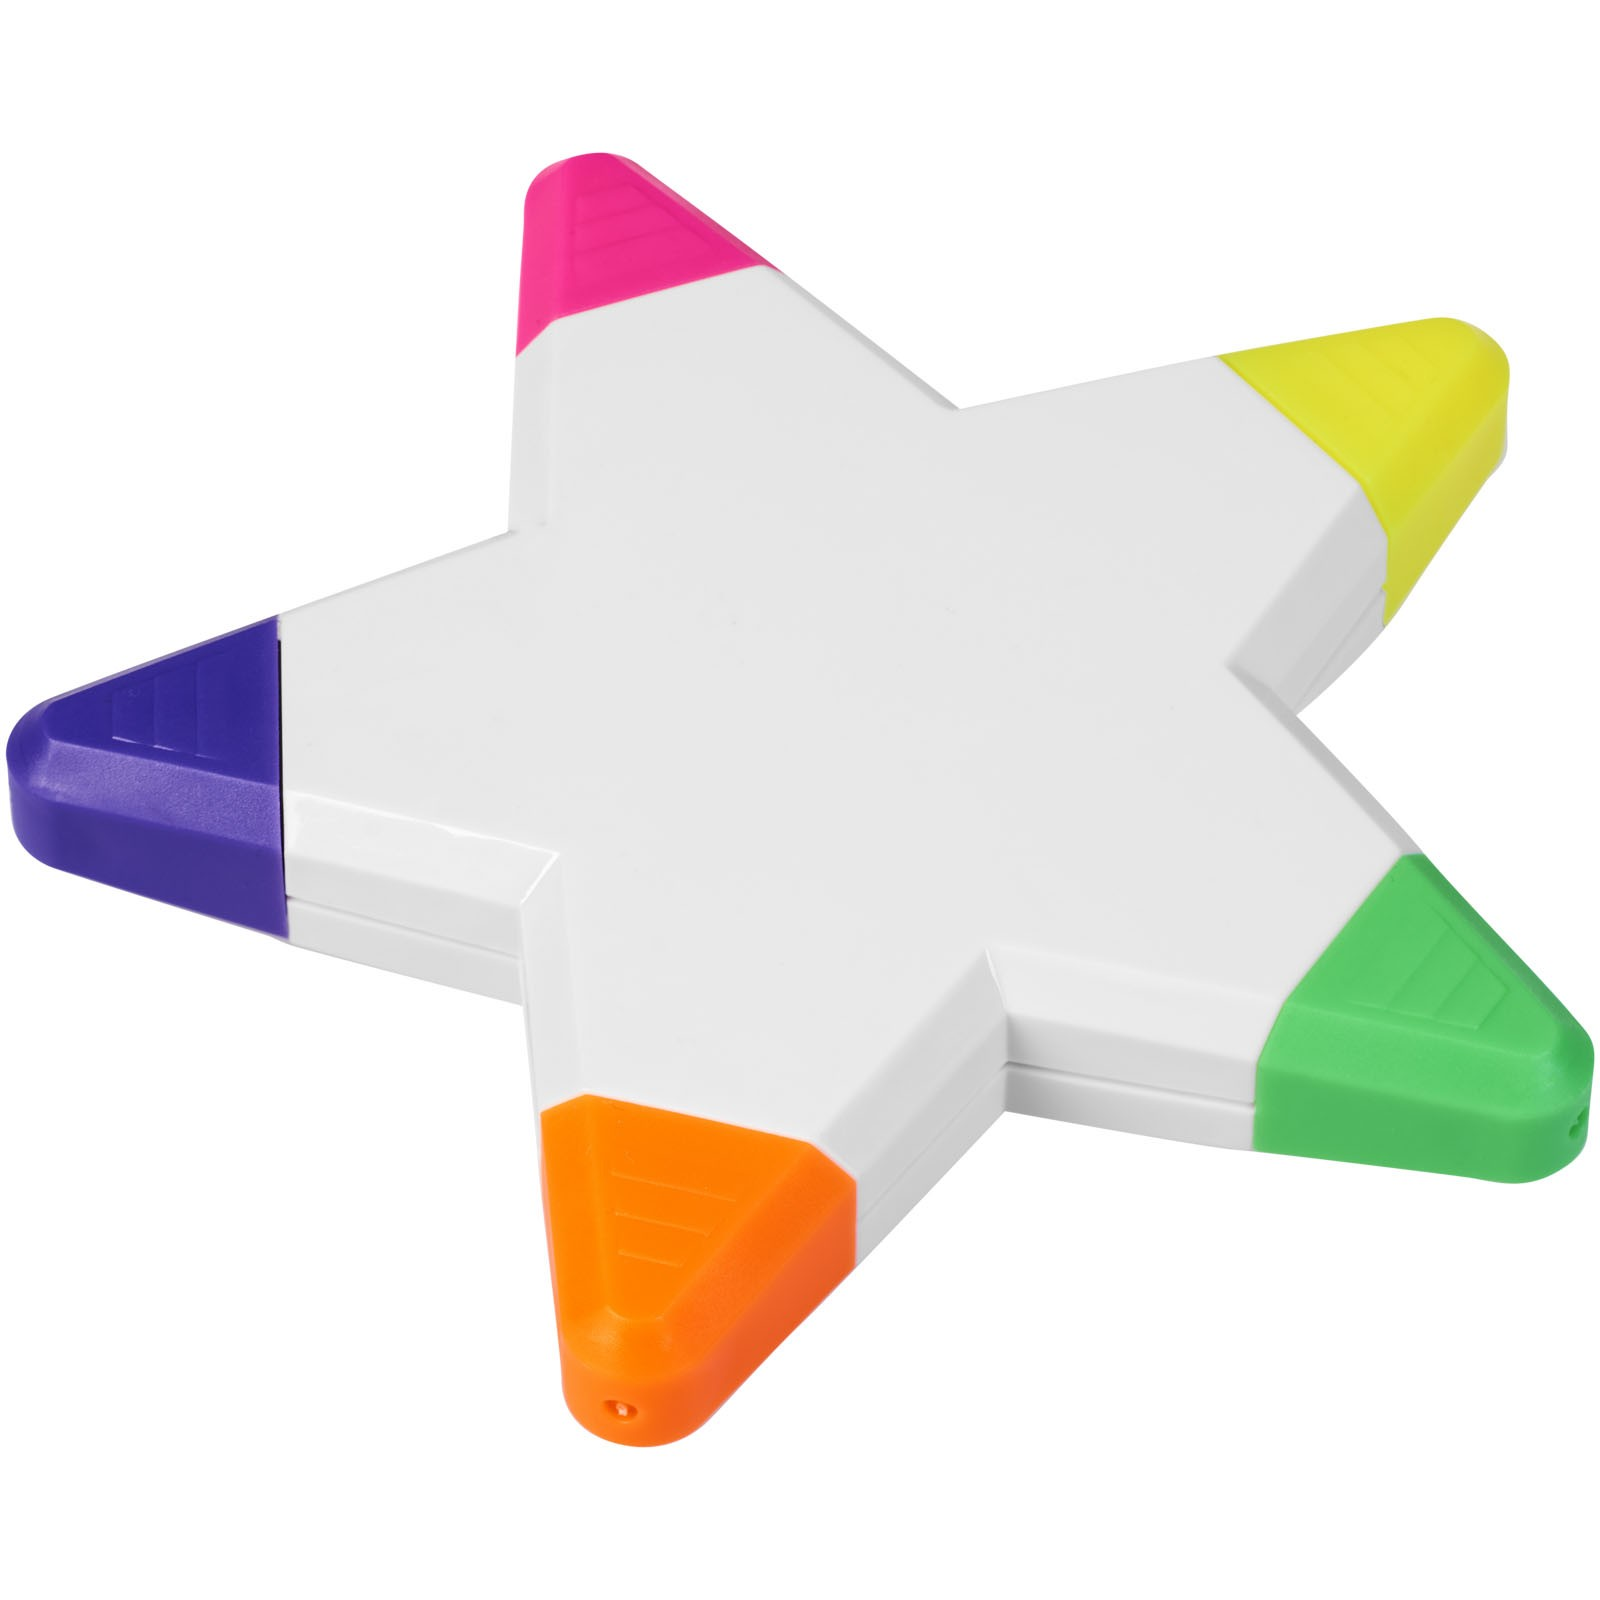 Solvig star highlighter